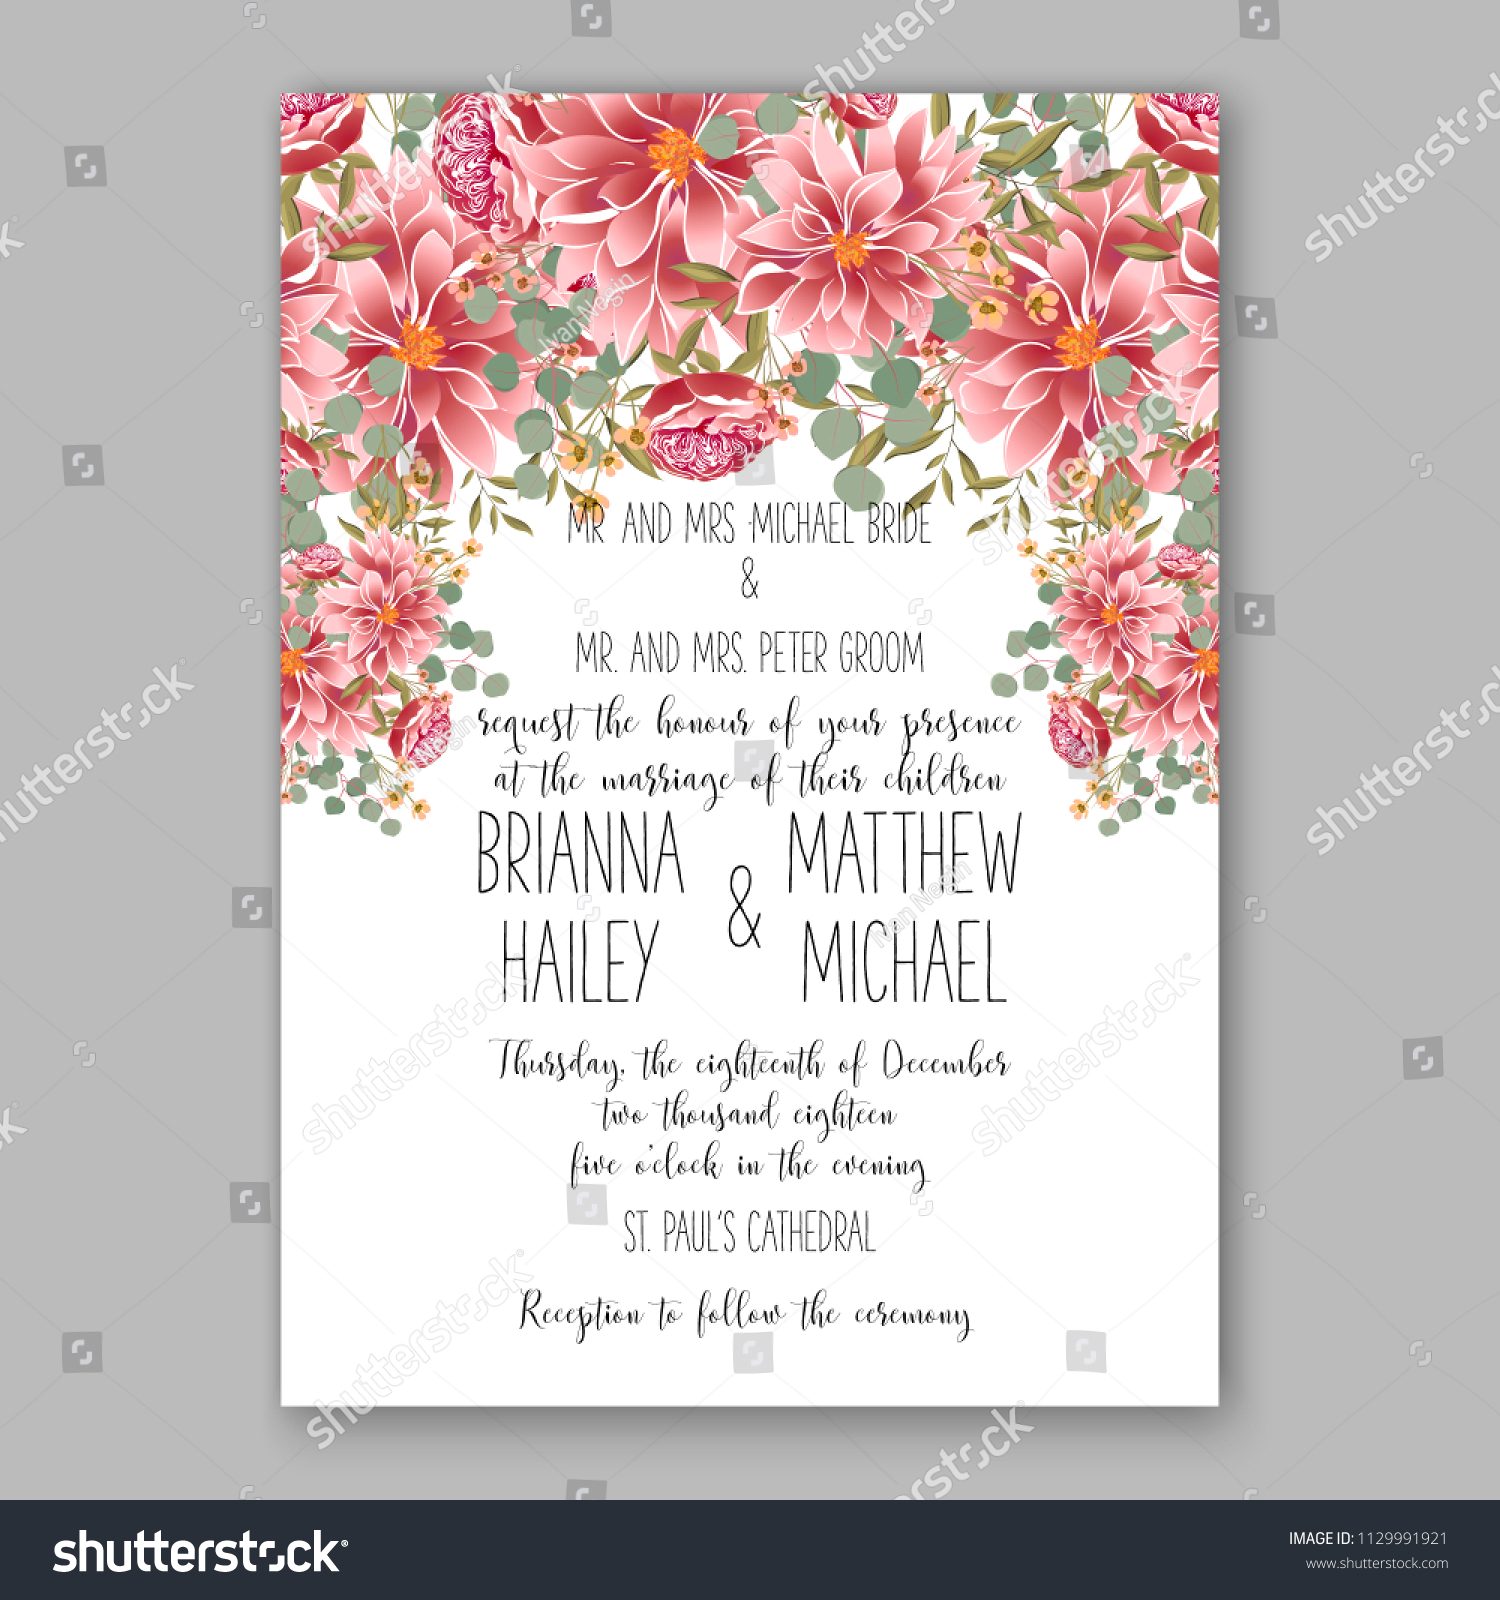 red dahlia daisy floral wedding invitation stock vector royalty